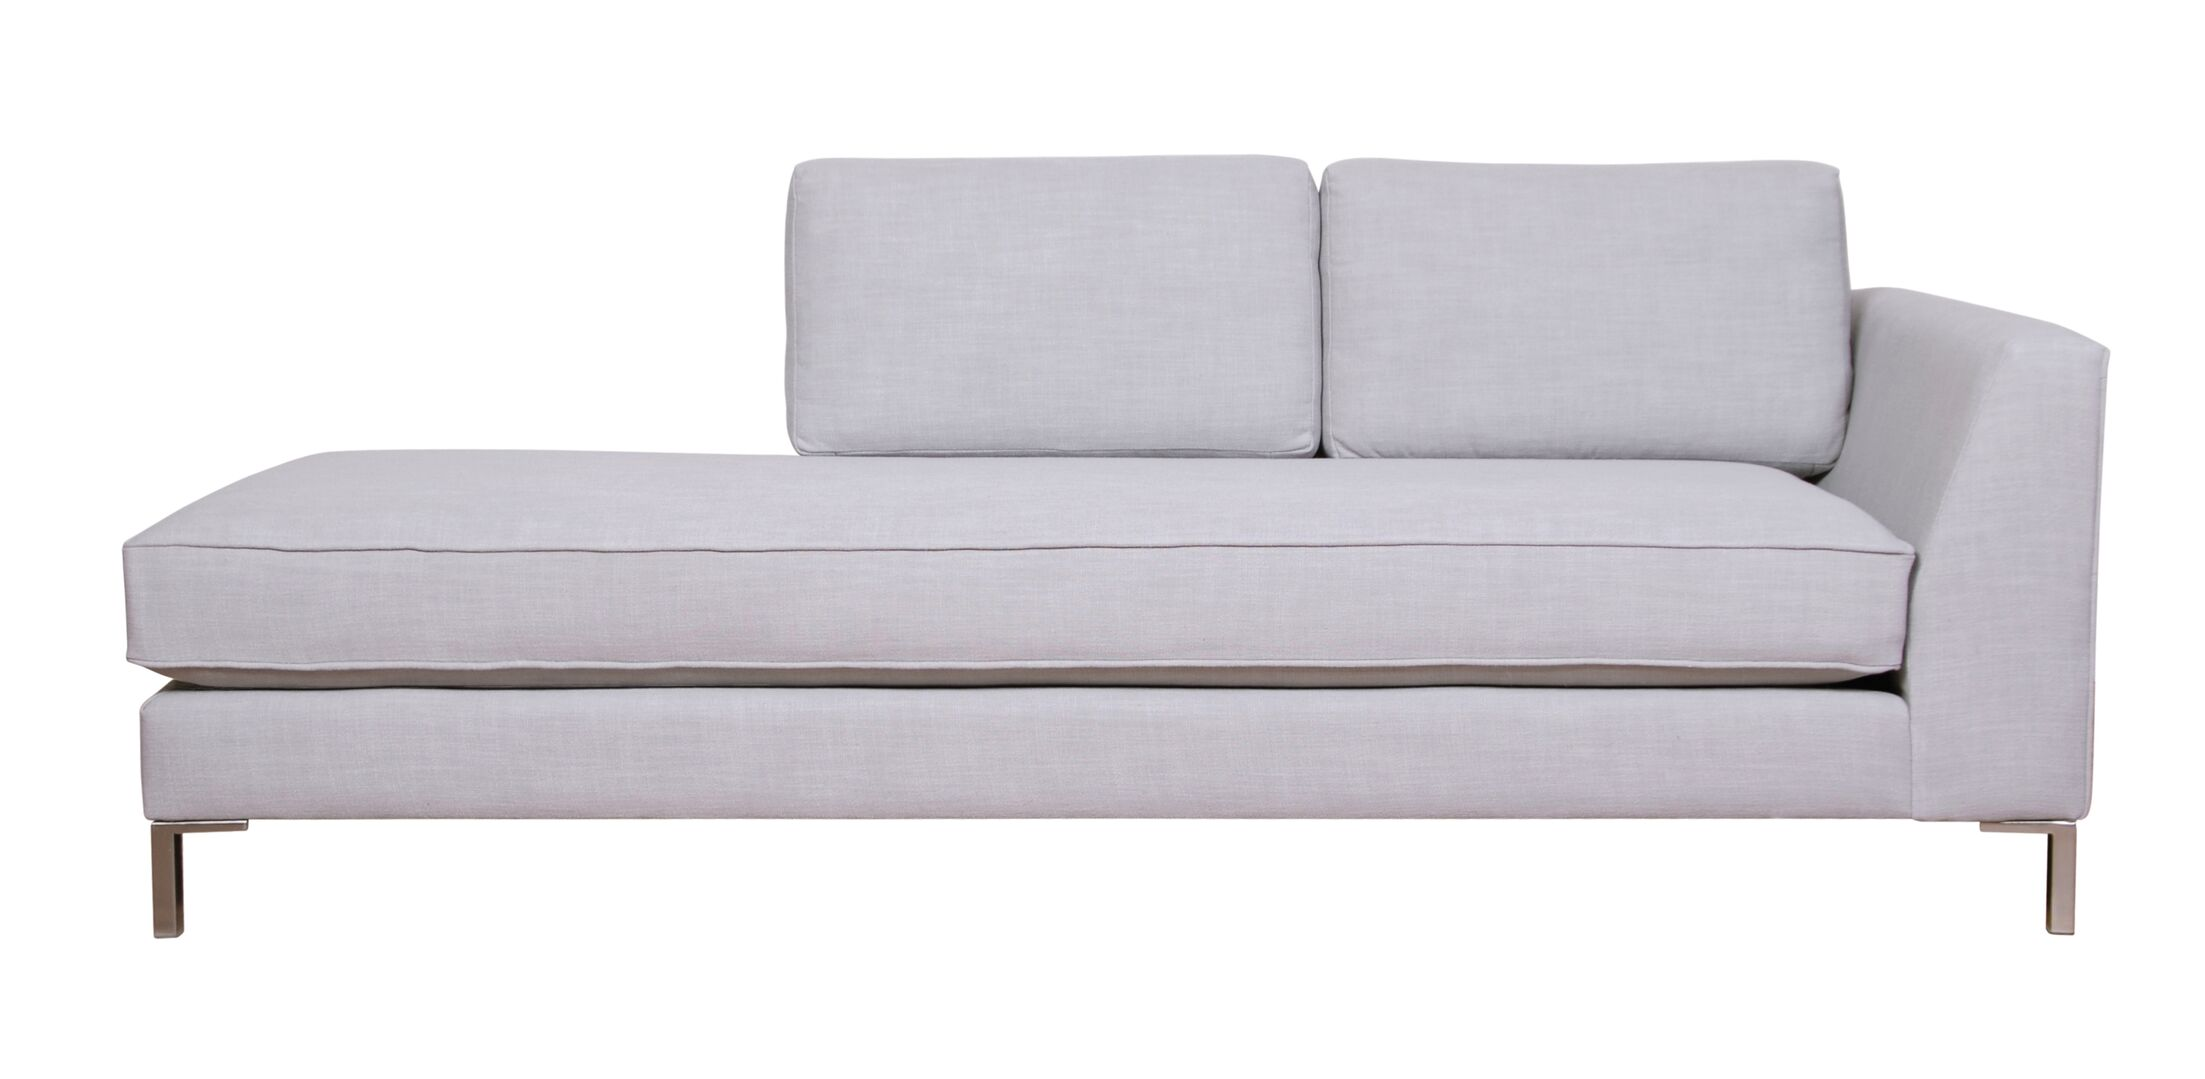 Belgium Chaise Lounge Upholstery: Brampton Gunmetal, Orientation: Left-Hand Facing